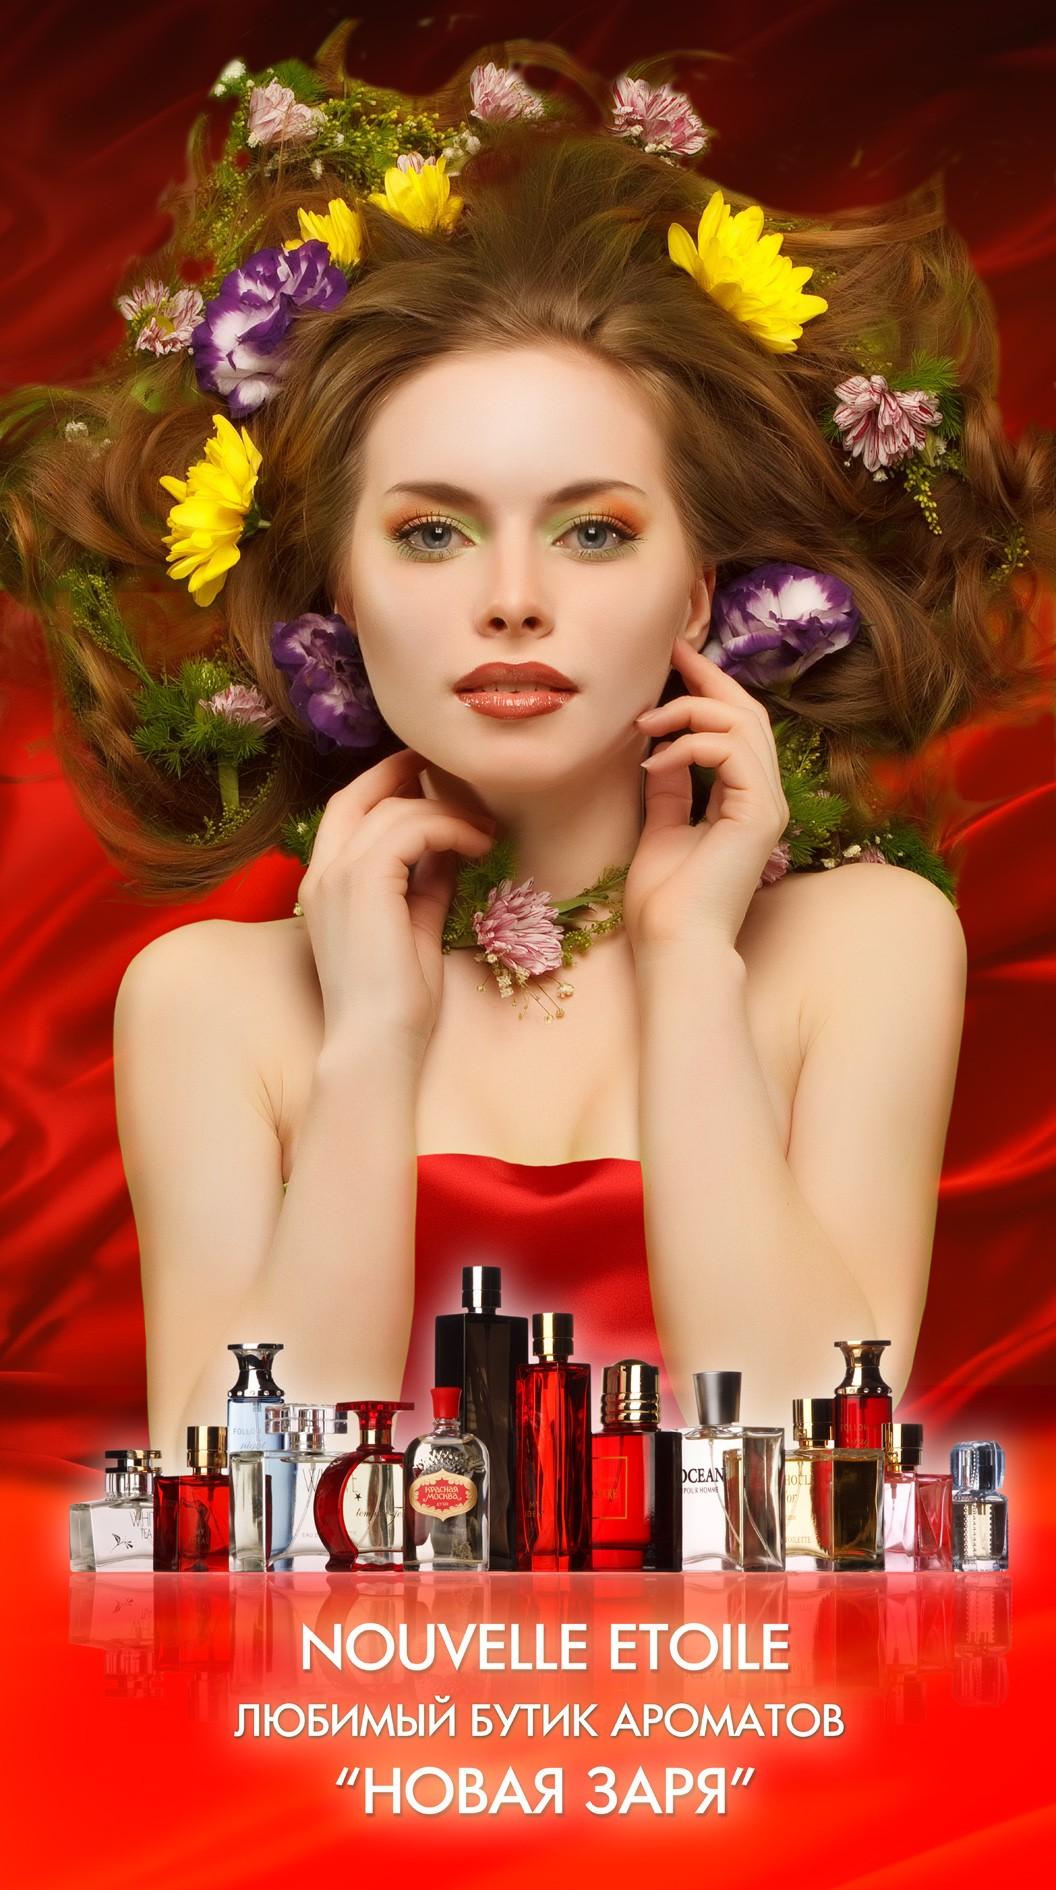 реклама косметики и парфюмерии картинки оставил спорт